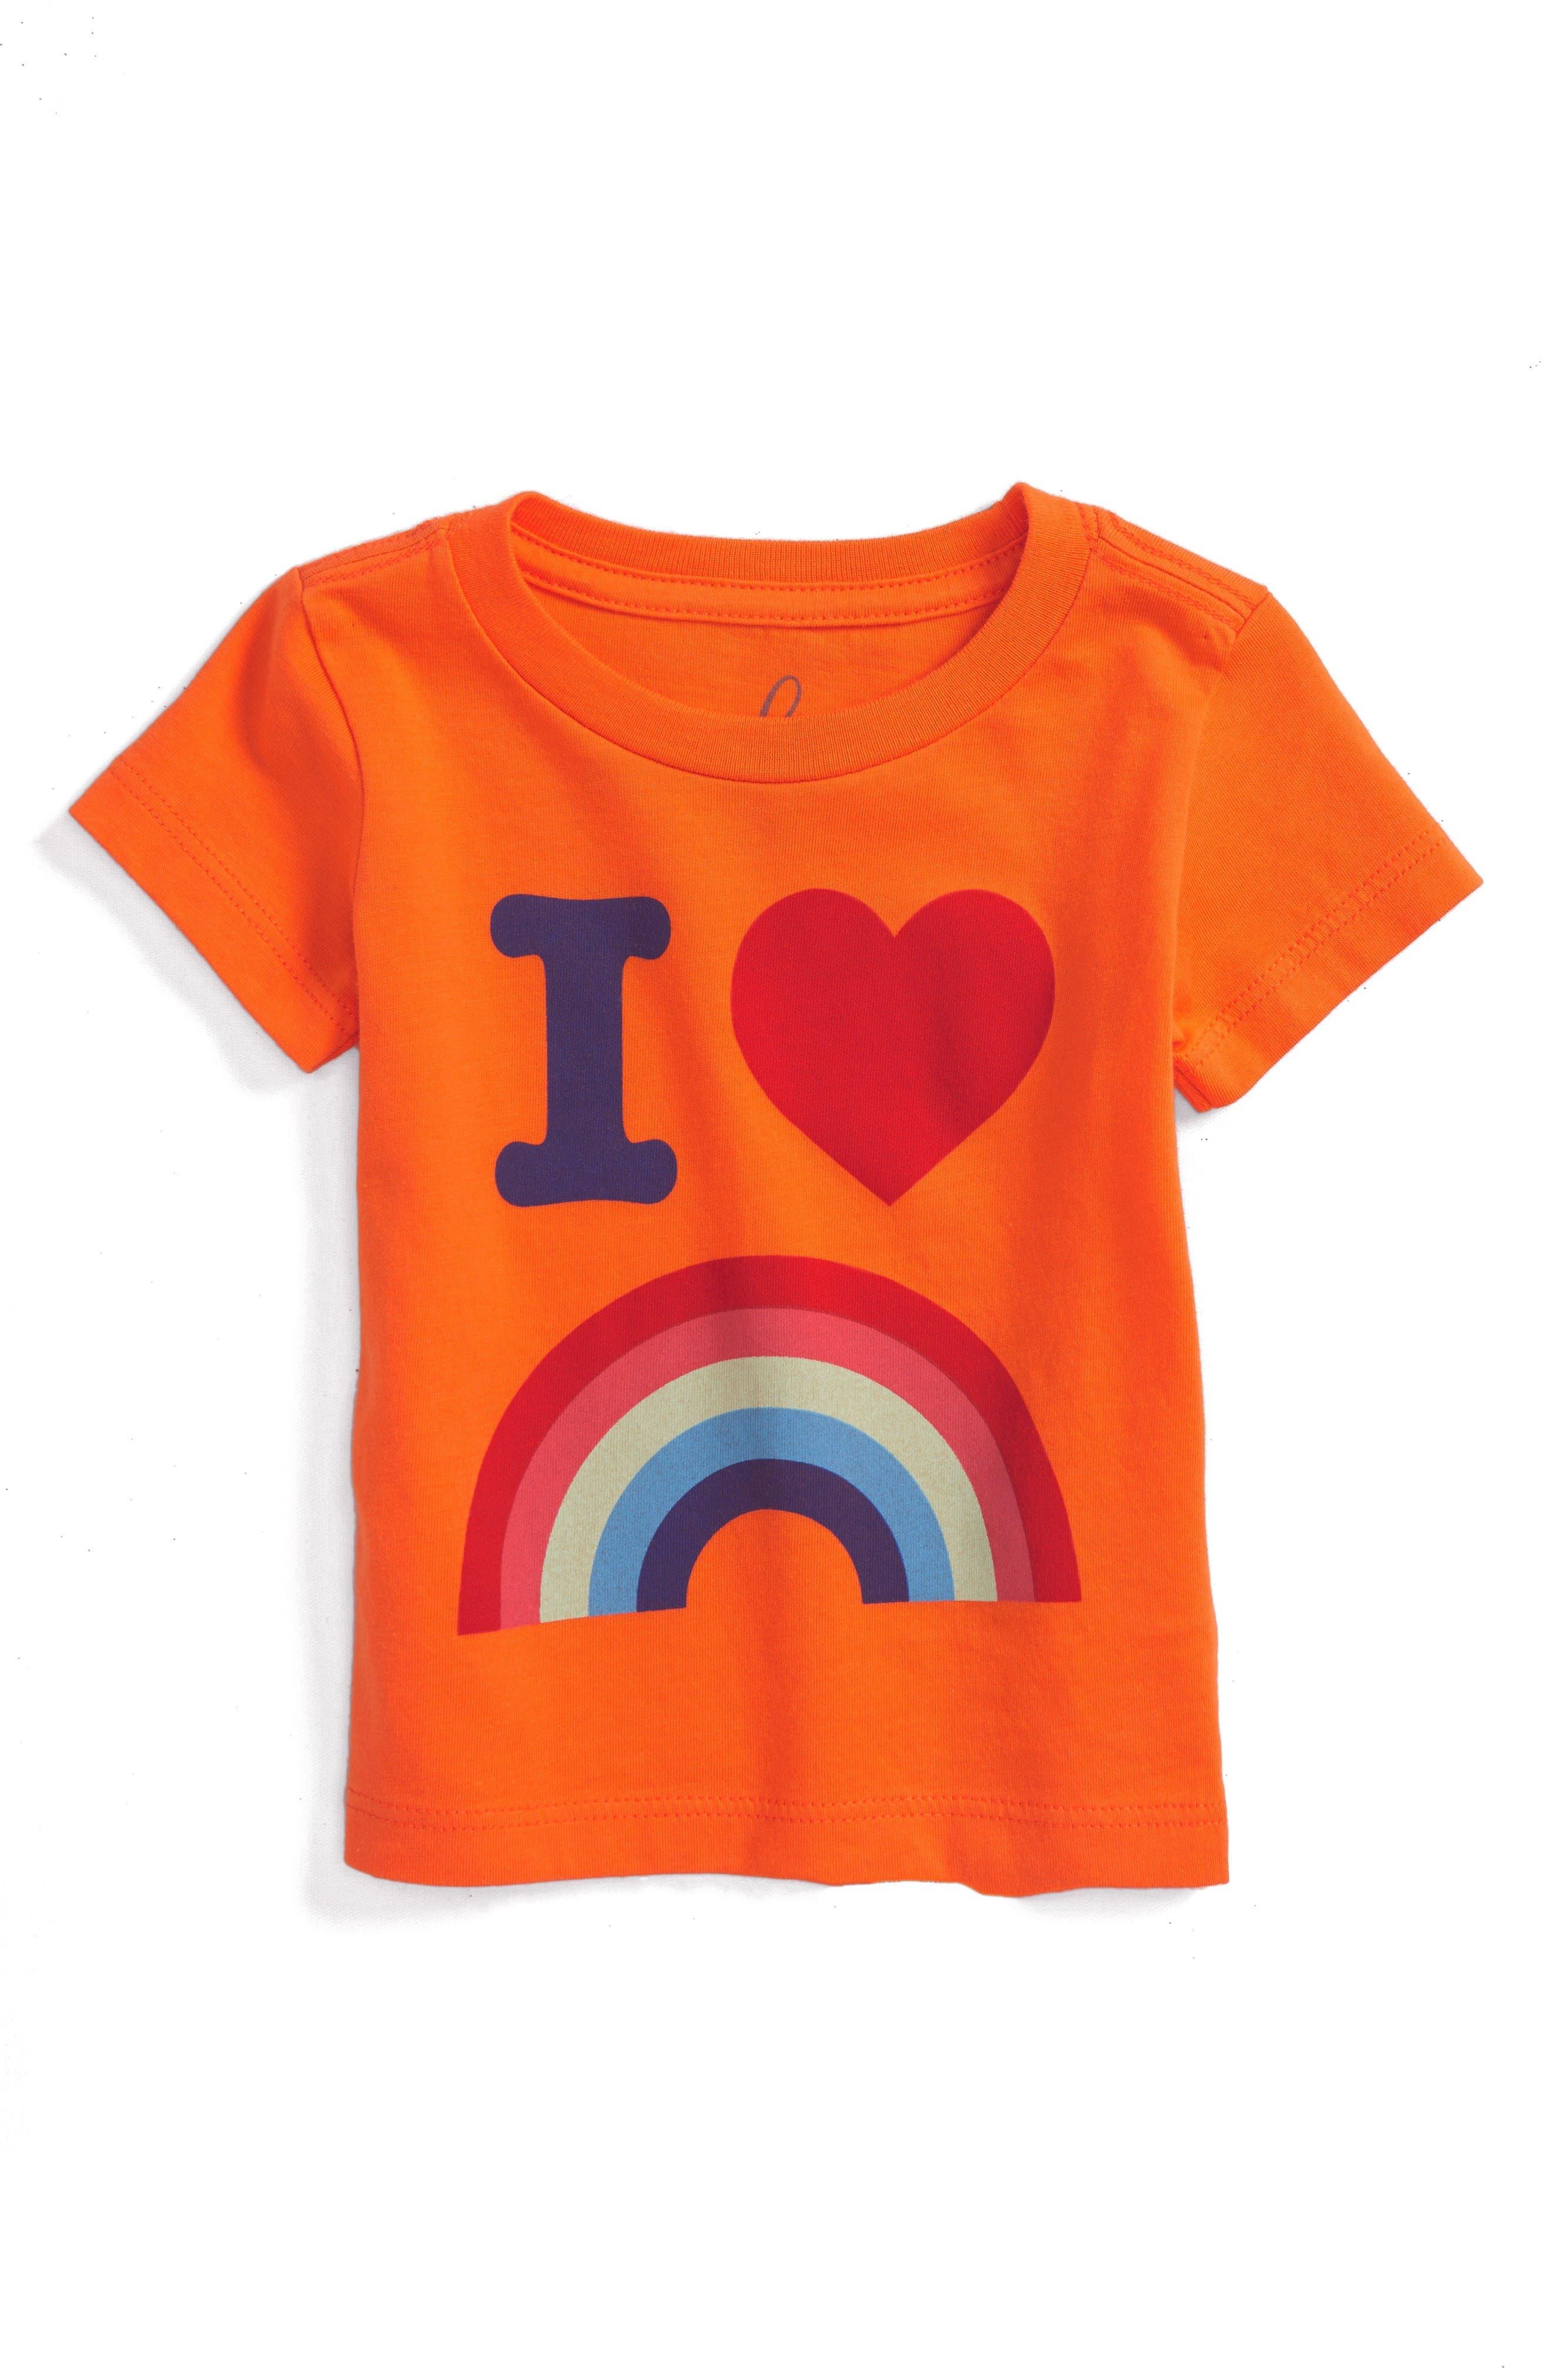 PEEK ESSENTIALS Peek Rainbow Graphic T-Shirt